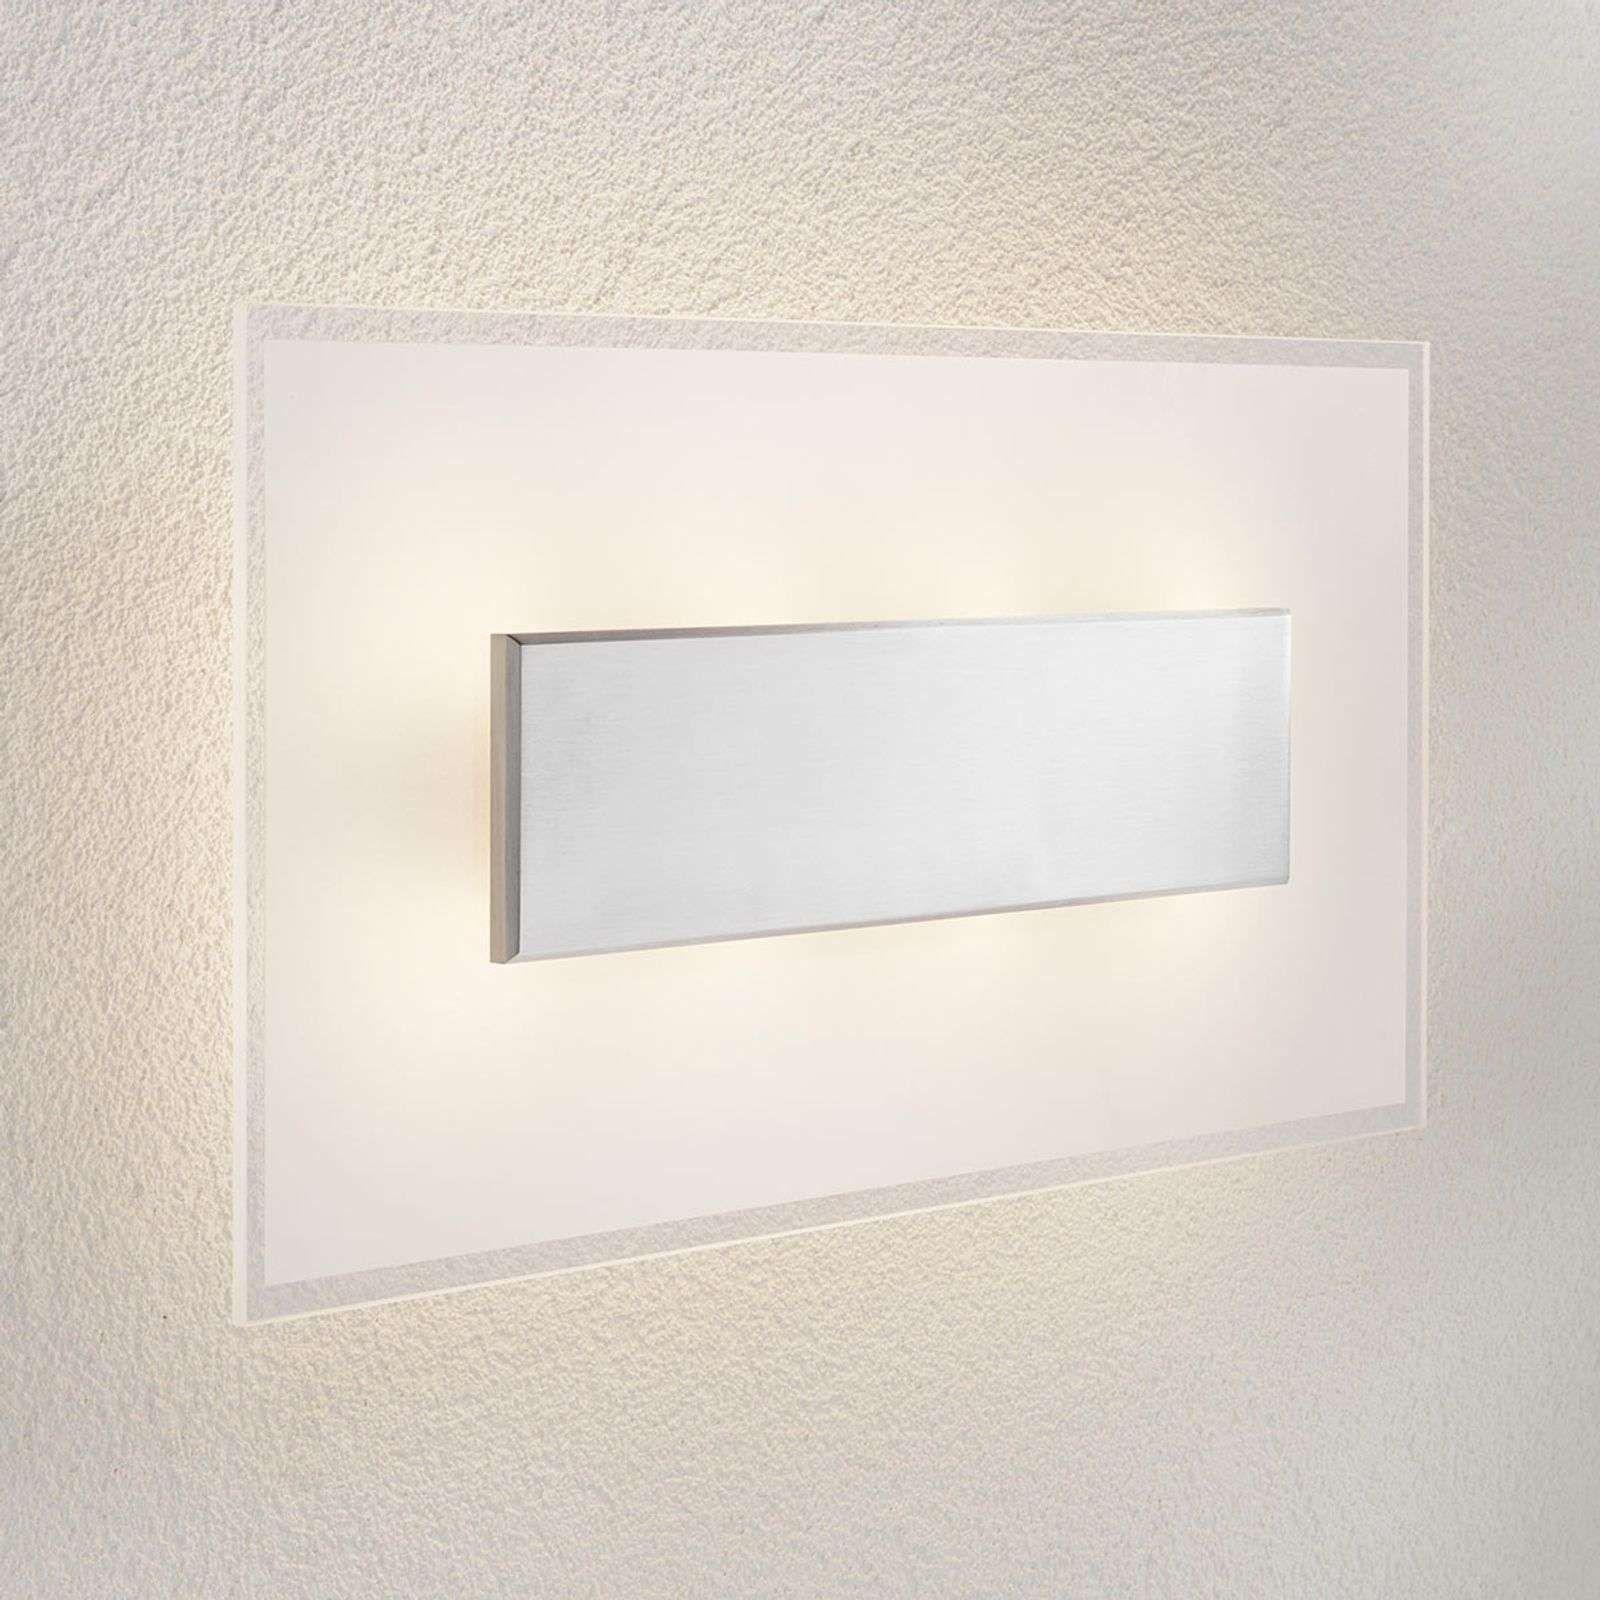 Plafondlamp Zwart Goud Plafondlamp Wit Stof Hornbach Plafonnieres Badkamer Plafondlamp Led Plafond Plafondlamp Plafondverlichting Indirecte Verlichting